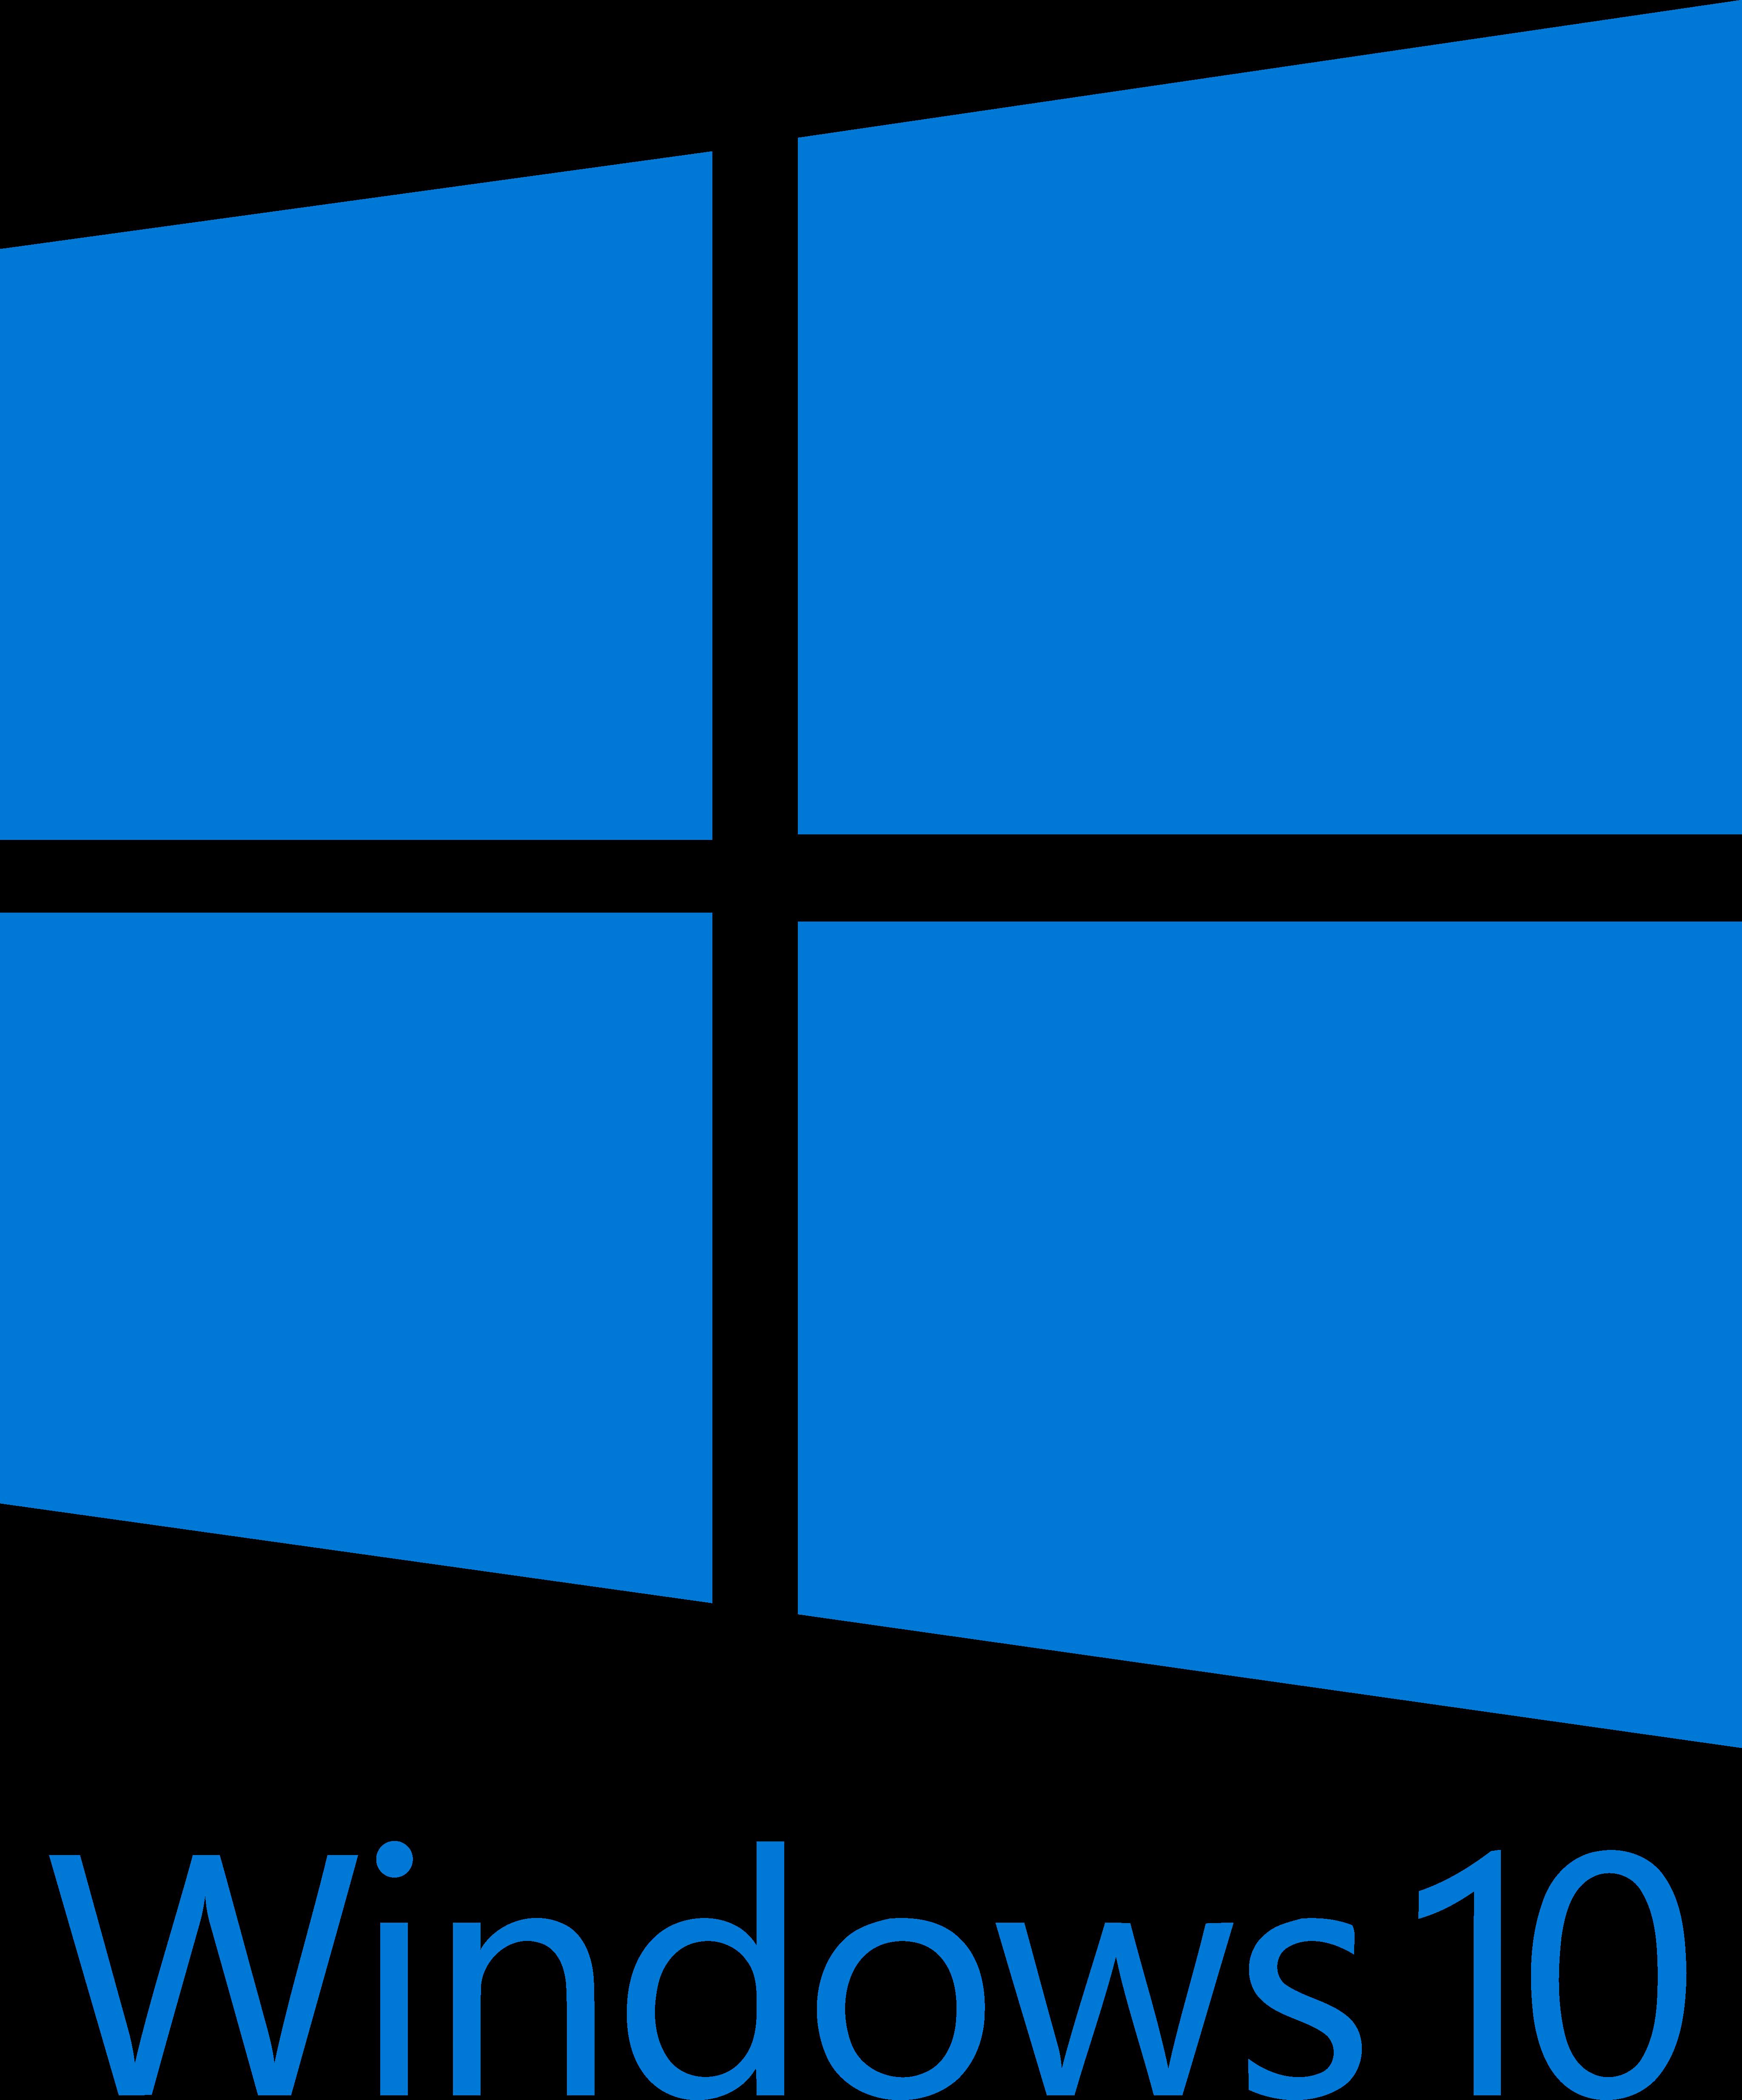 windows 10 logo 2 - Windows 10 Logo